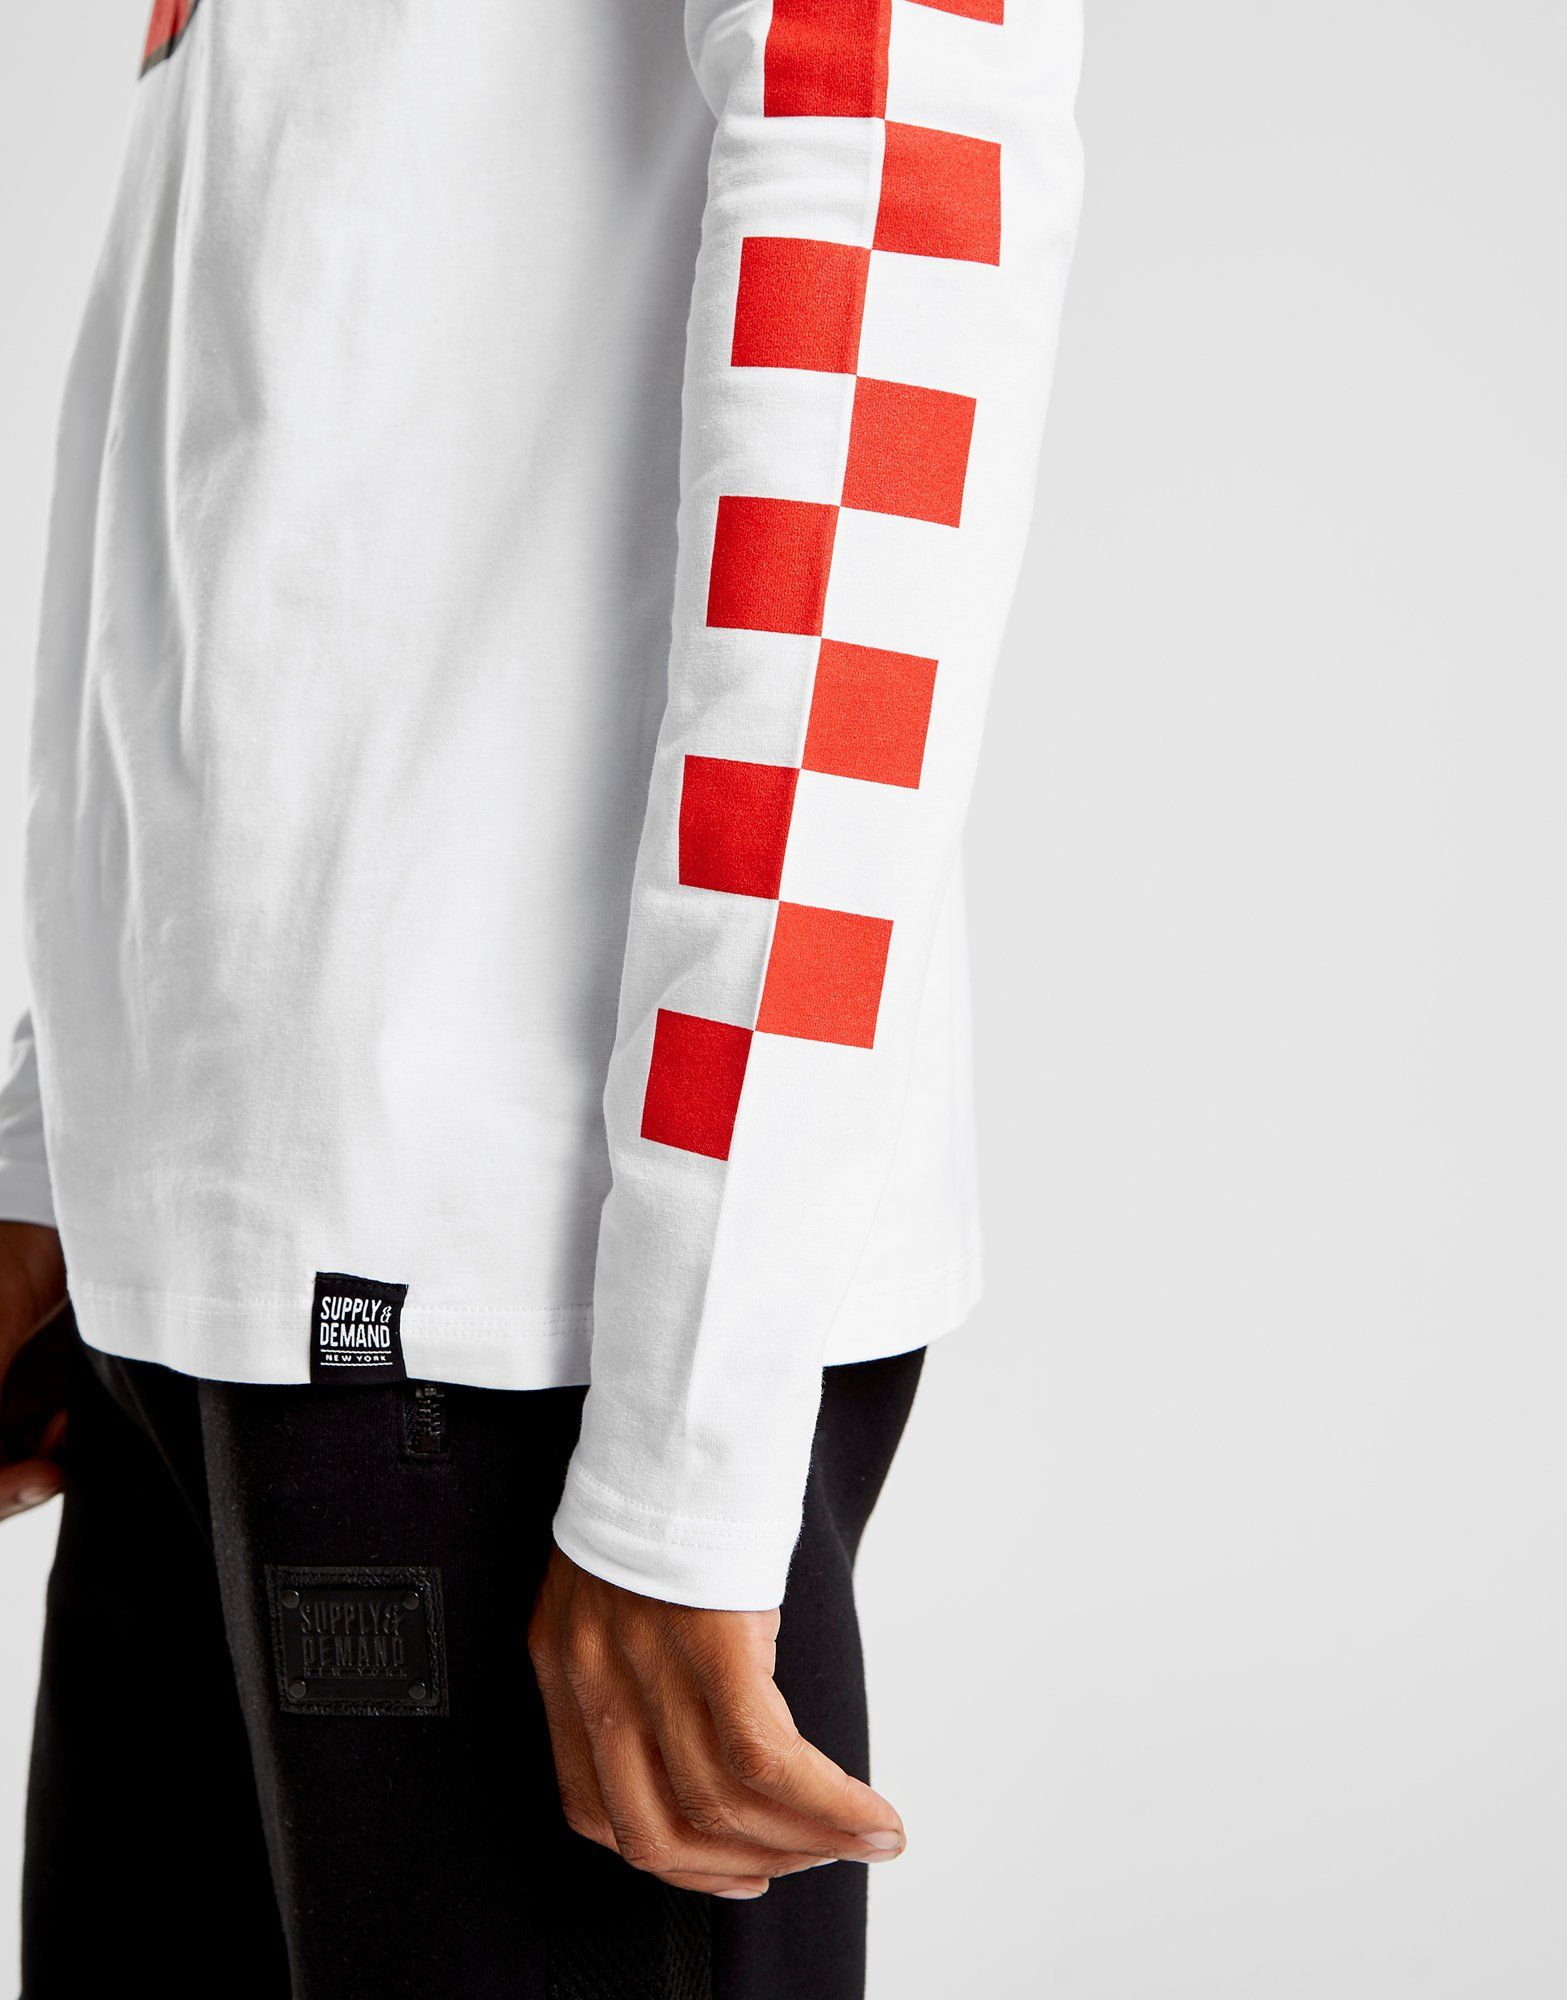 Supply & Demand Rae Sremmurd Long Sleeve T-Shirt